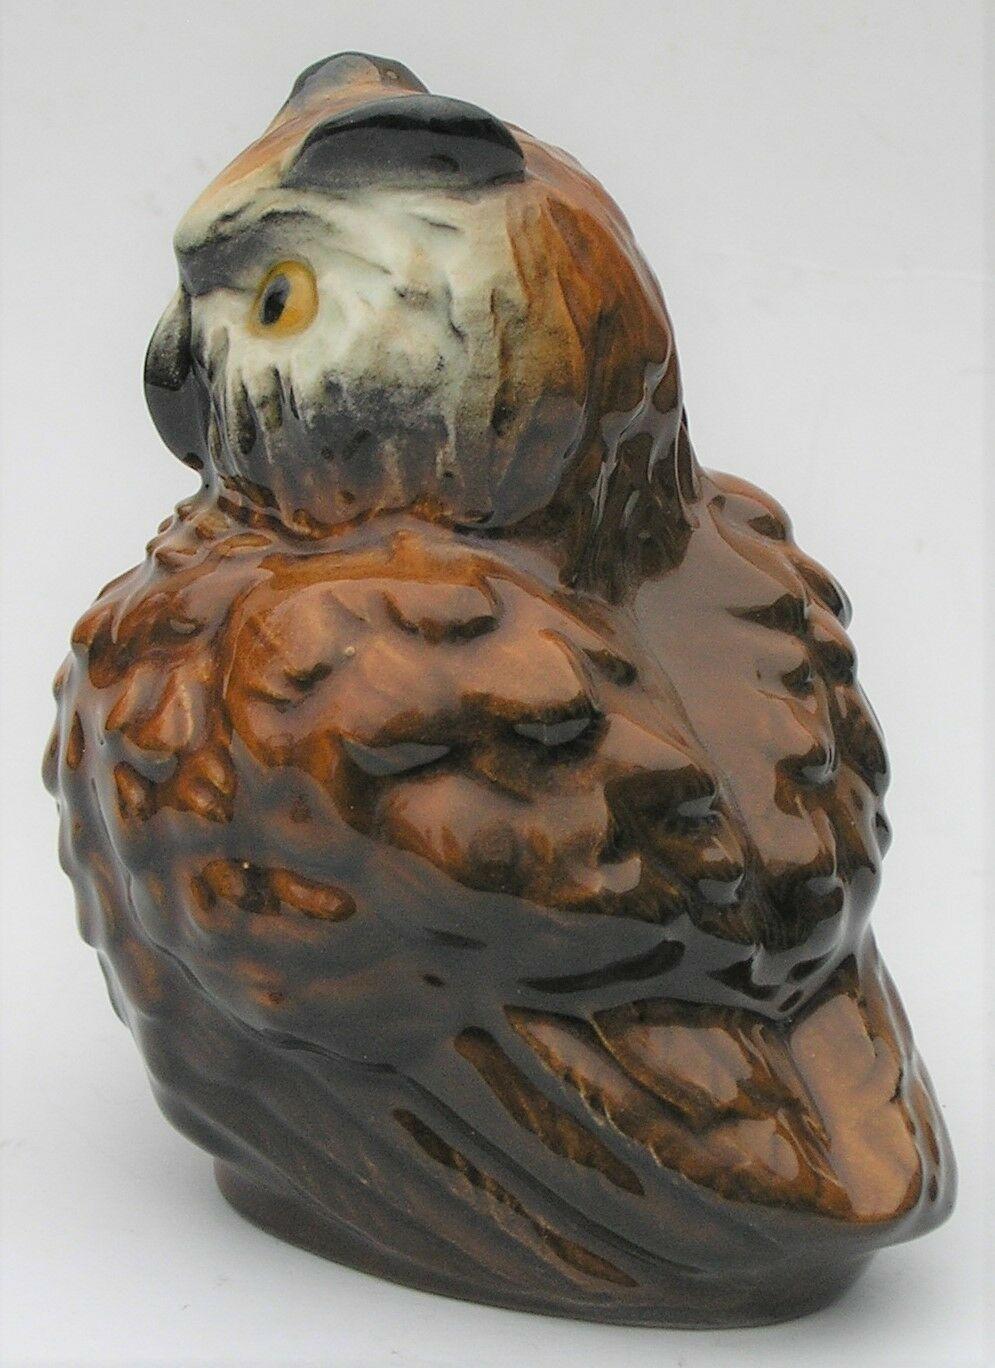 Vintage Owl Figurine Goebel Statue W. Germany 38316-08